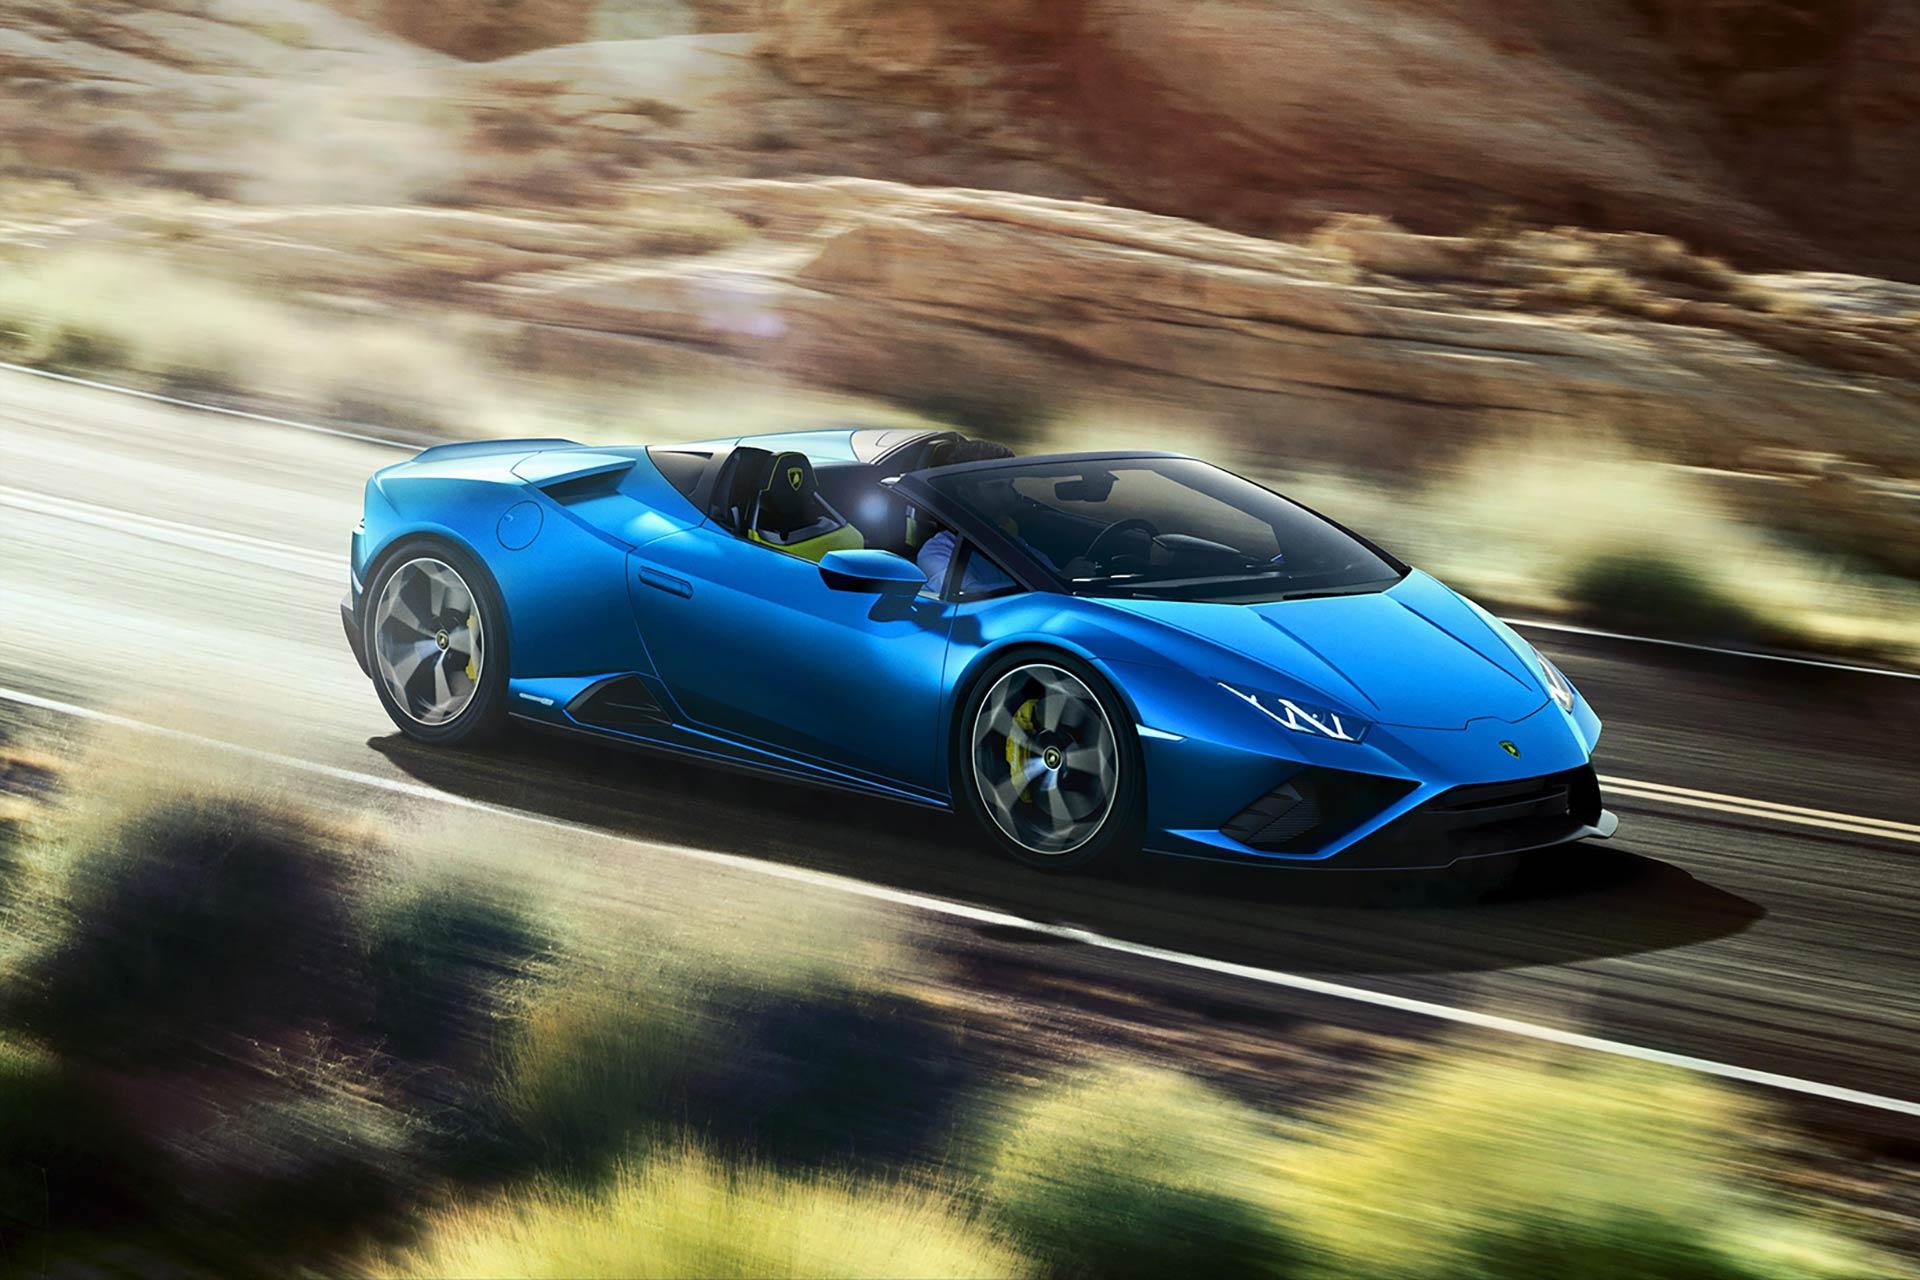 Der Lamborghini Huracán EVO Rear-Wheel Drive Spyder: Das Leben unter freiem Himmel zelebrieren